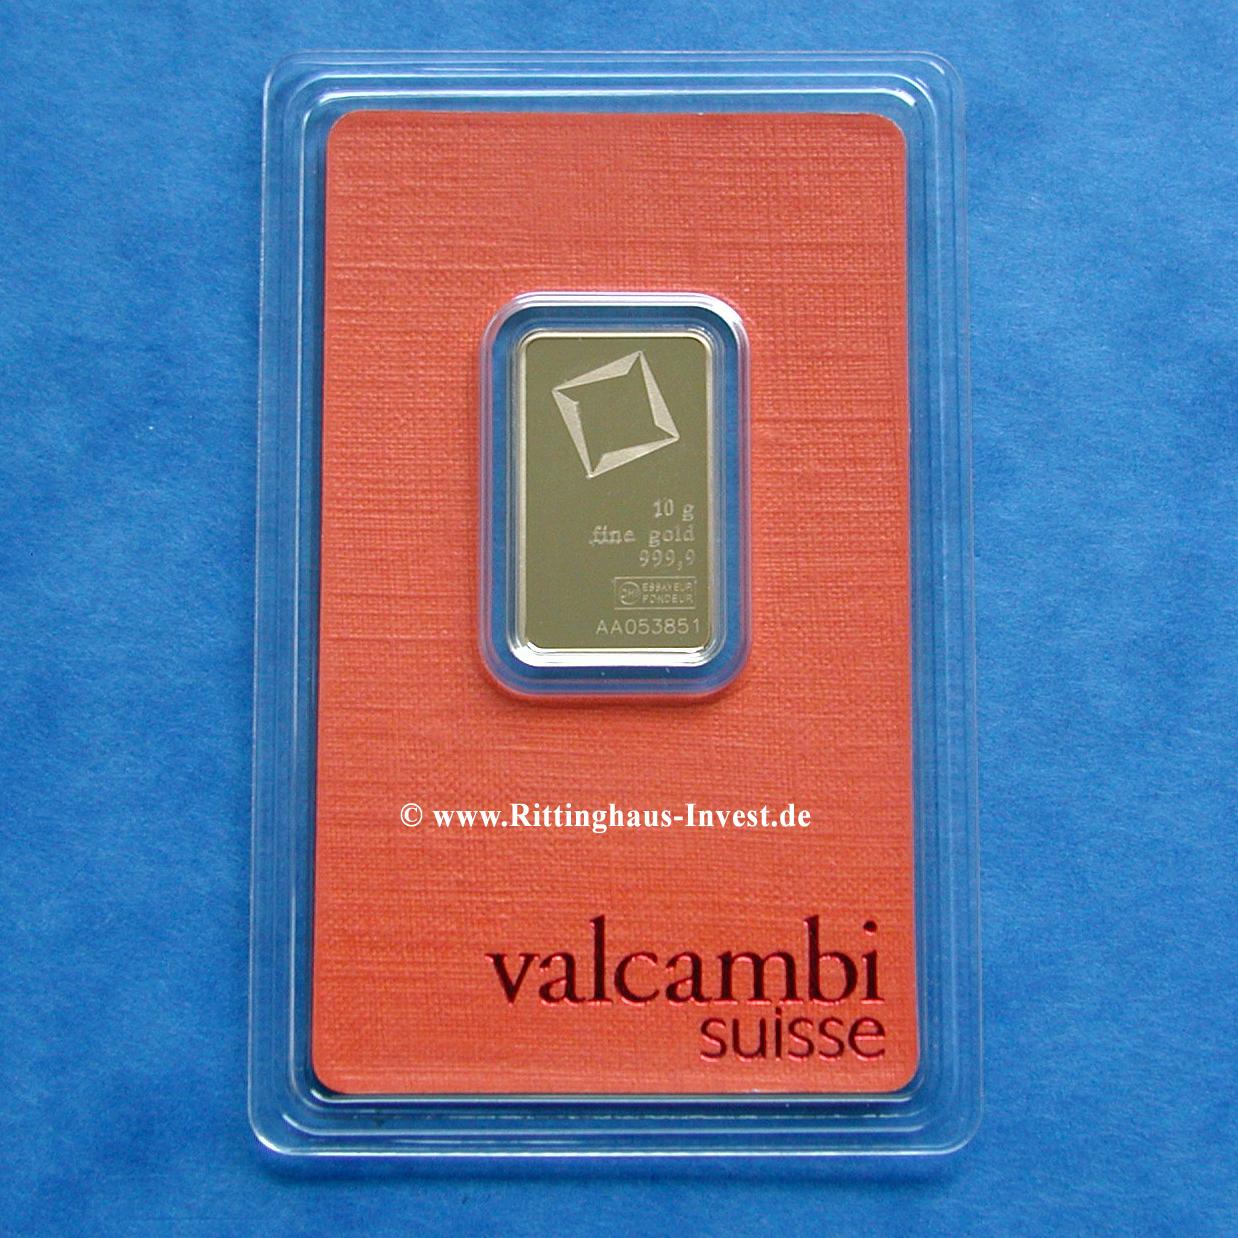 valcambi-10-gramm-goldbarren-blister